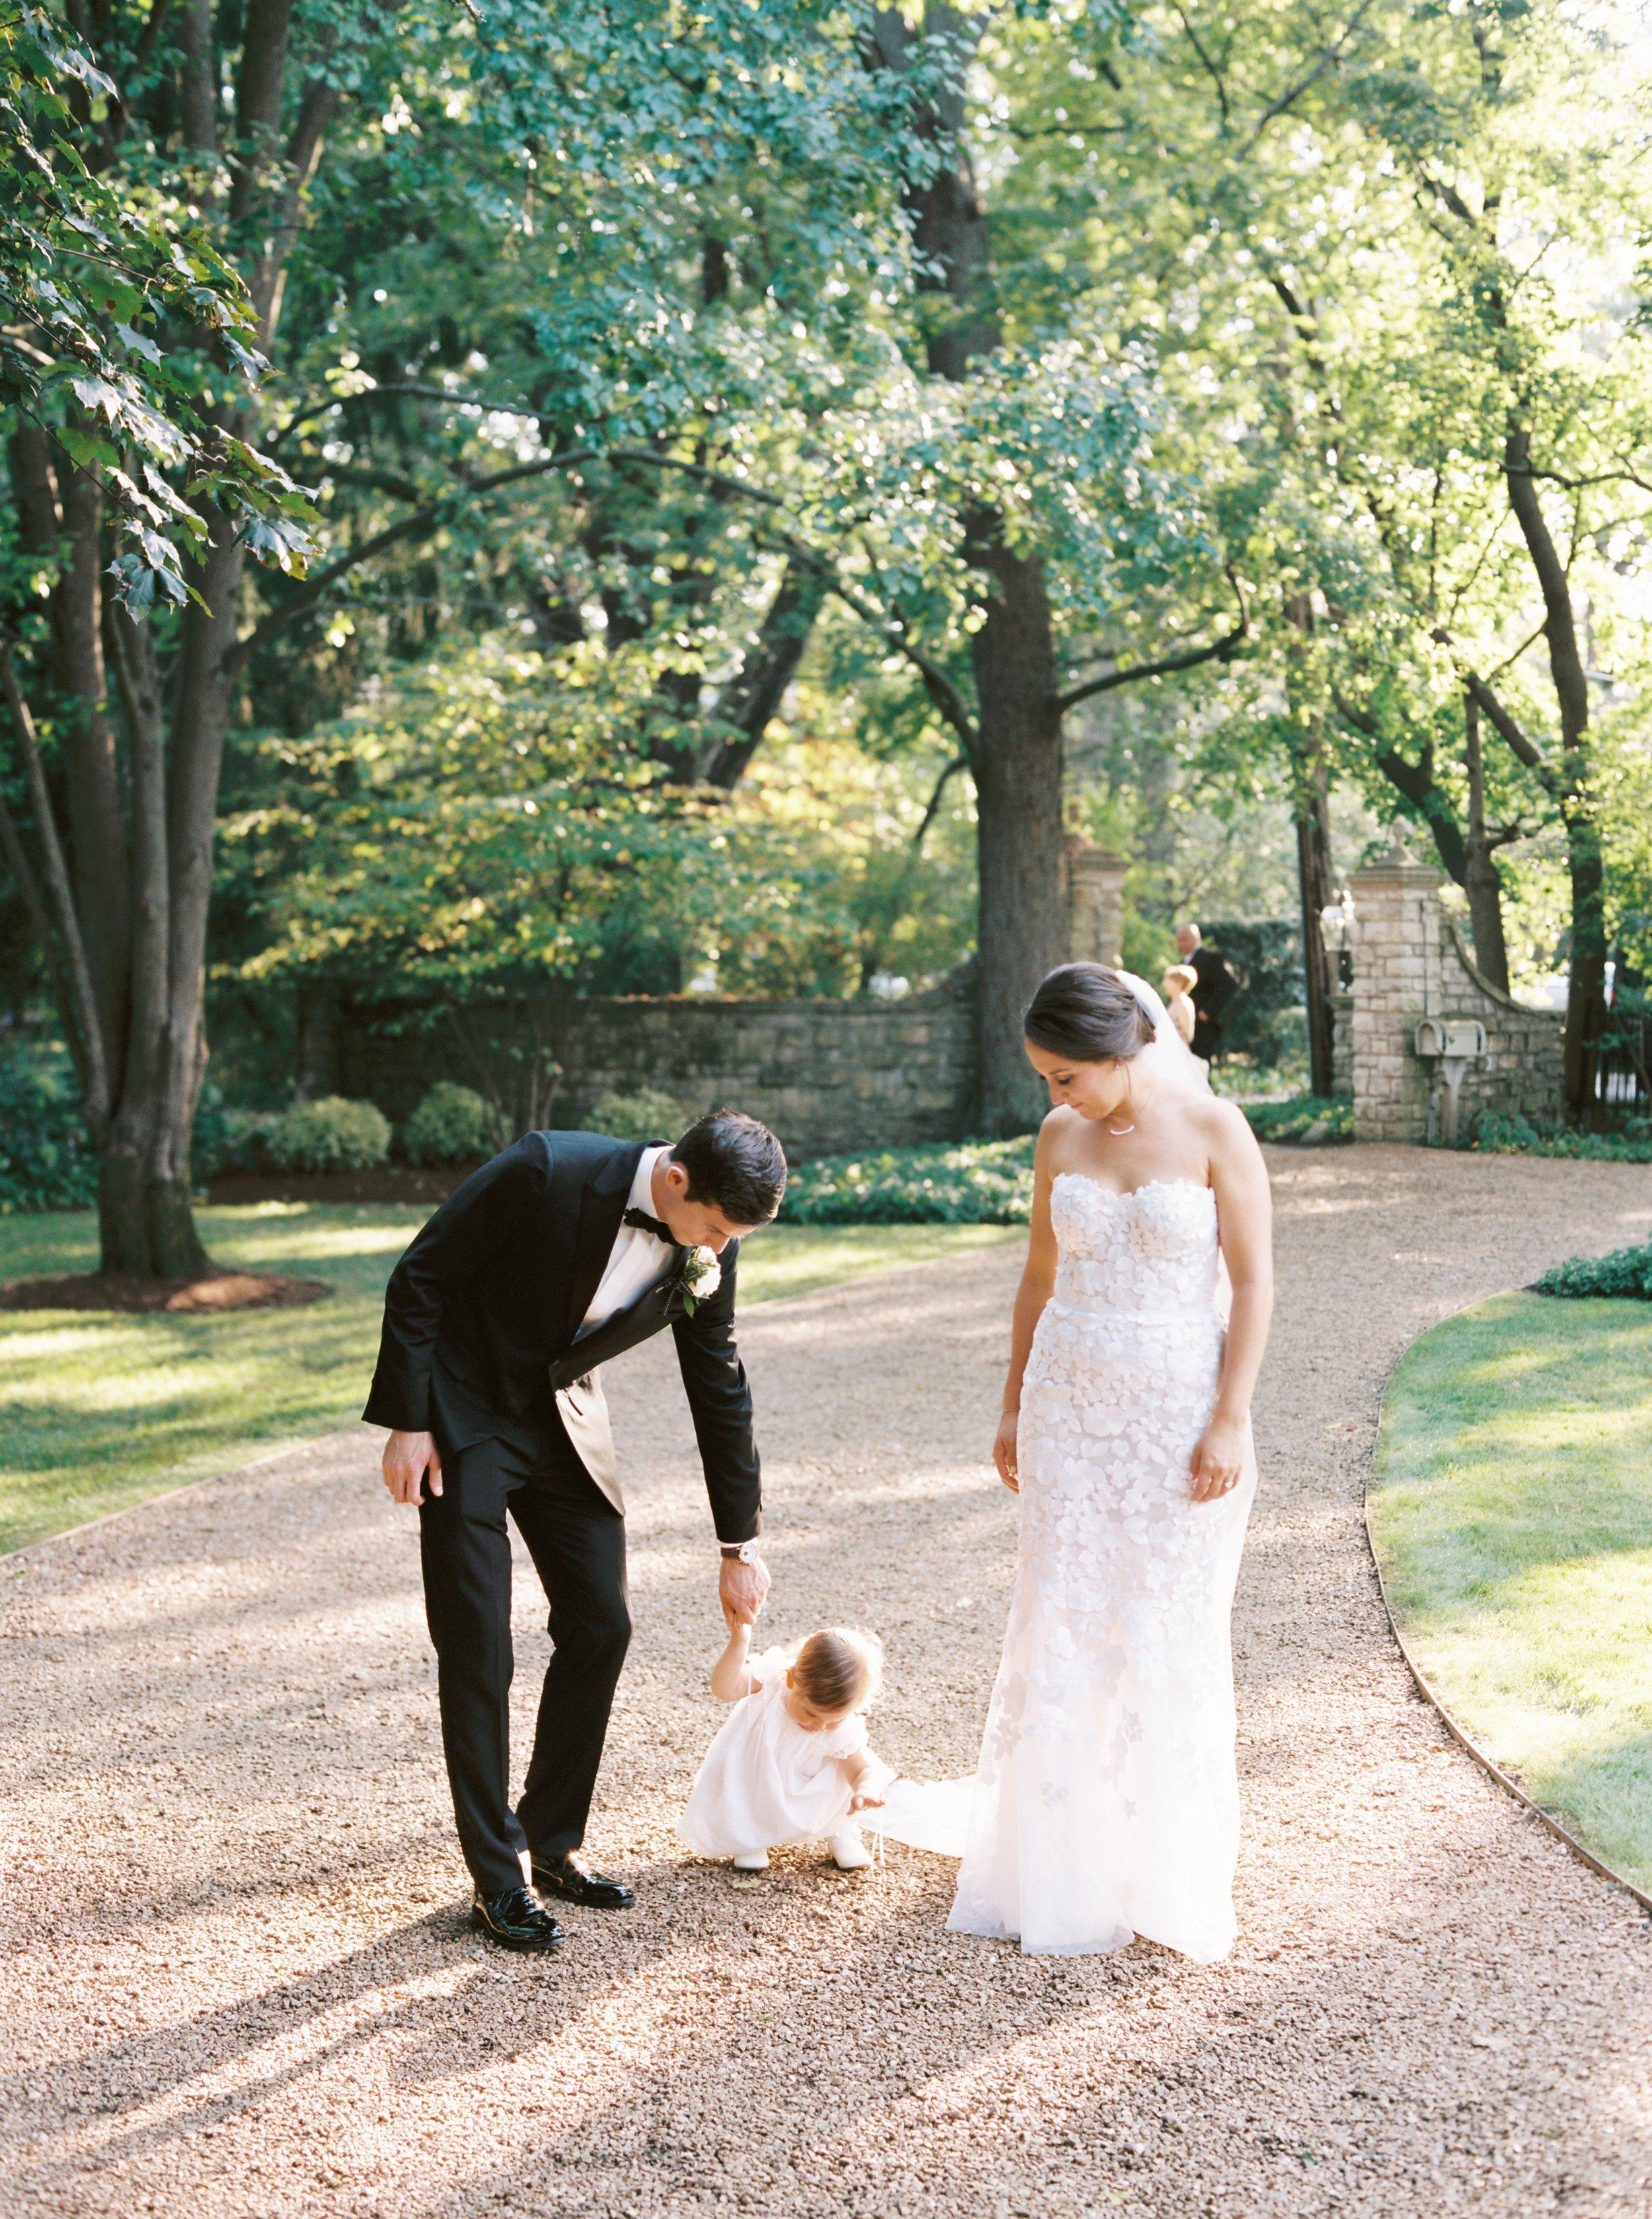 Kyle John l Fine Art Wedding Photography l Chicago, Copenhagen, California, New York, Destination l Blog l Kate and Michael_Winnetka_20